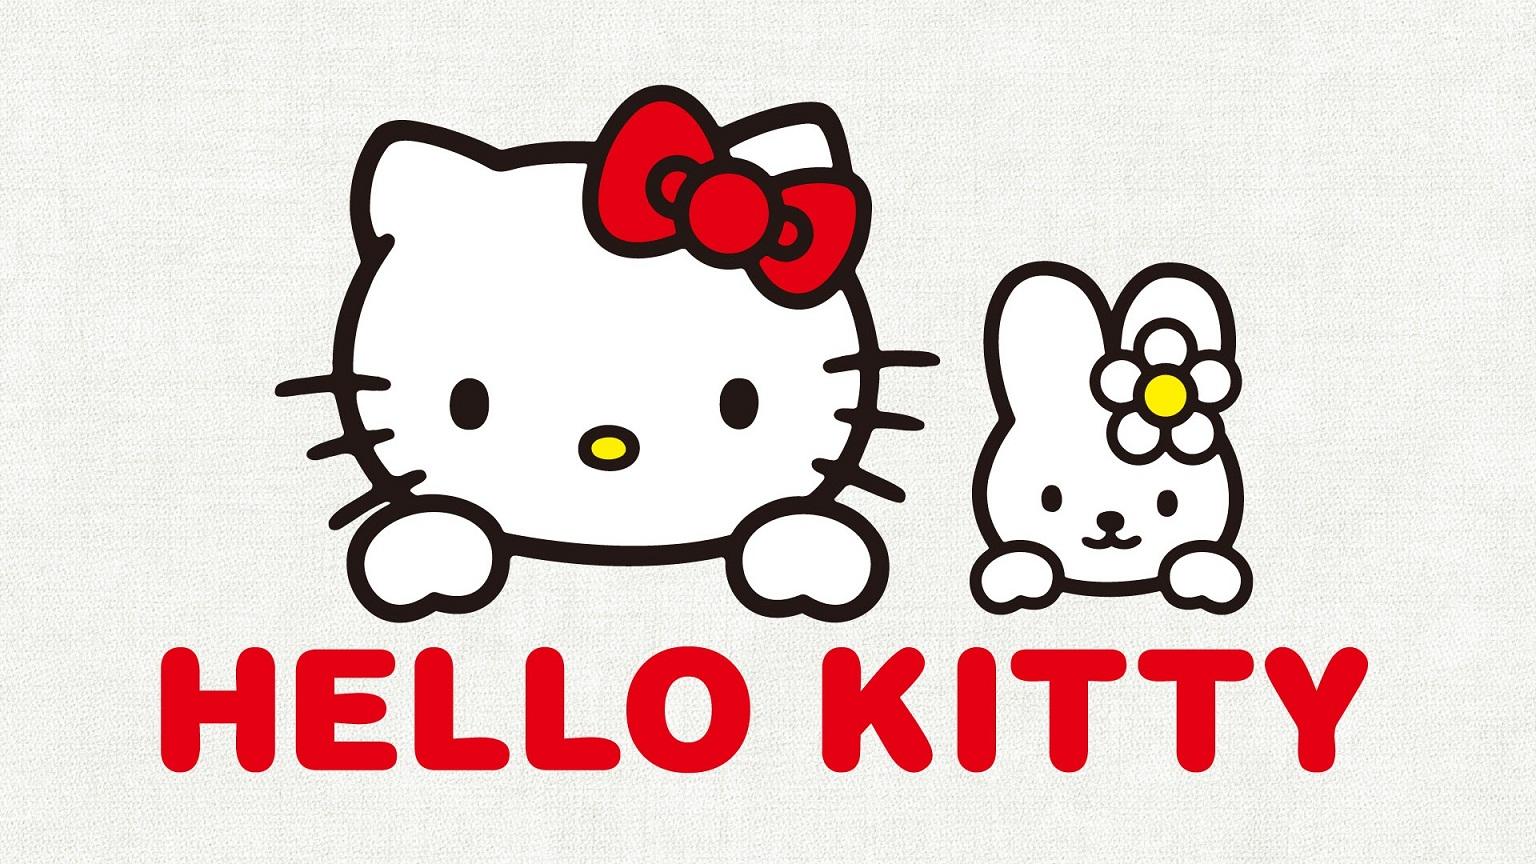 Wonderful Wallpaper Hello Kitty Vintage - XzrYD9  Perfect Image Reference_23787.jpg